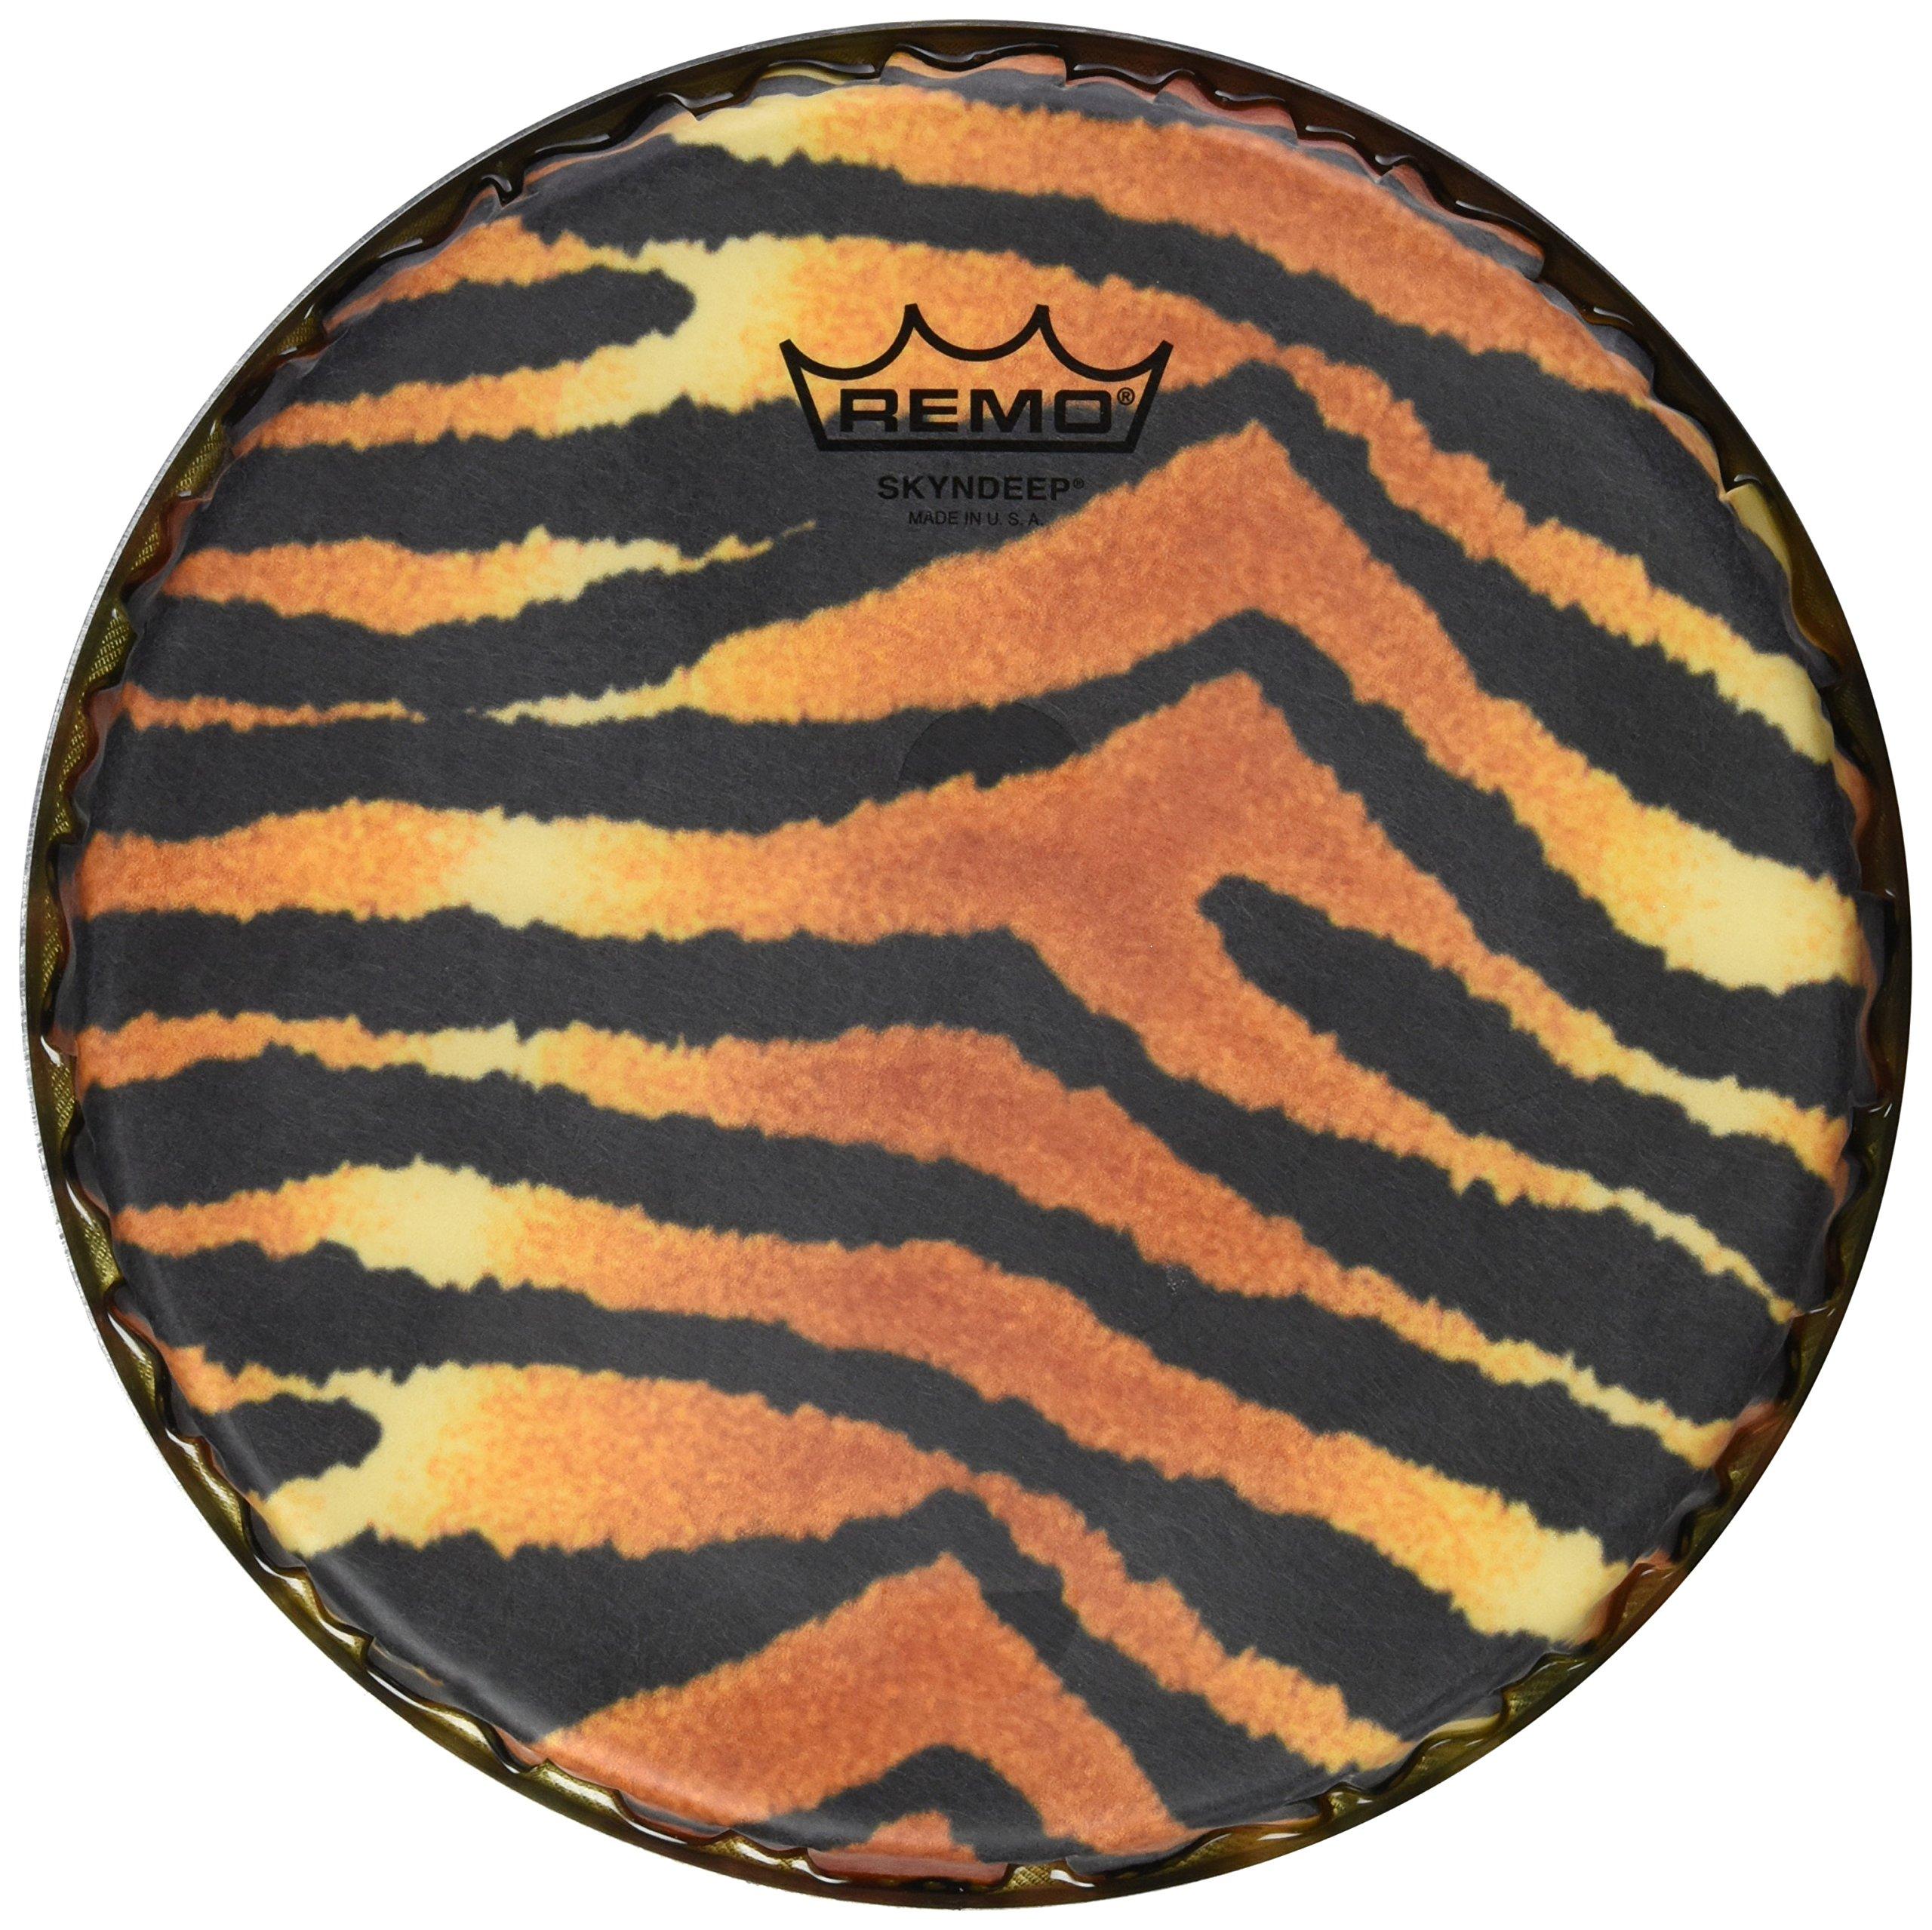 Remo Bongo Drumhead, R-Series, 9.00'', SKYNDEEP, ''Tiger Stripe'' Graphic